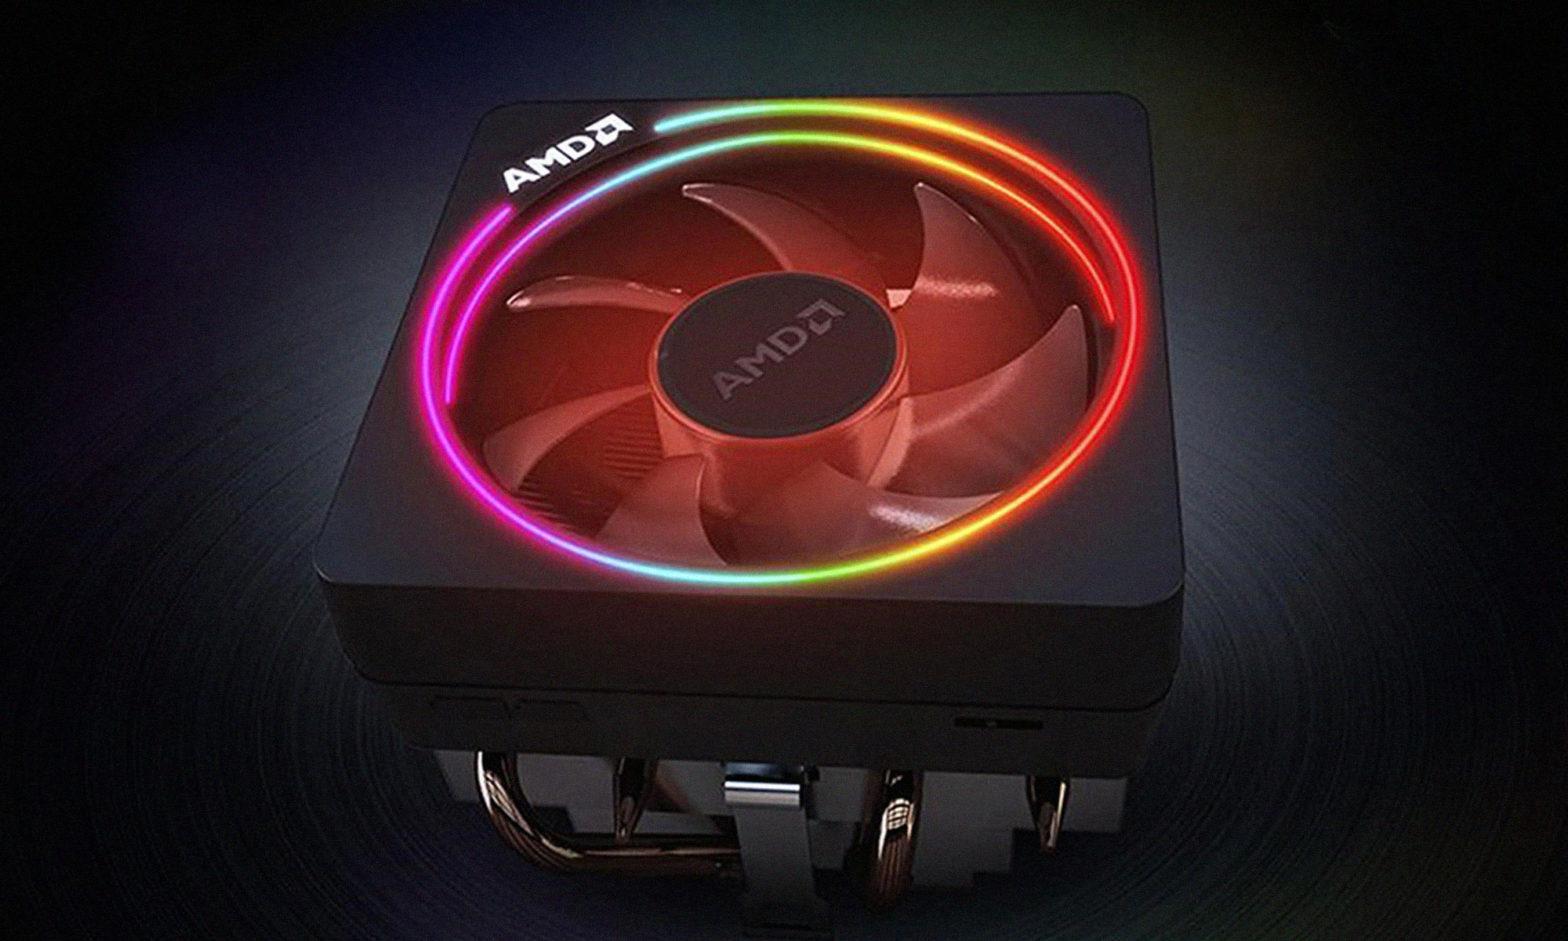 Razer Chroma for AMD Wraith Prism Cooler